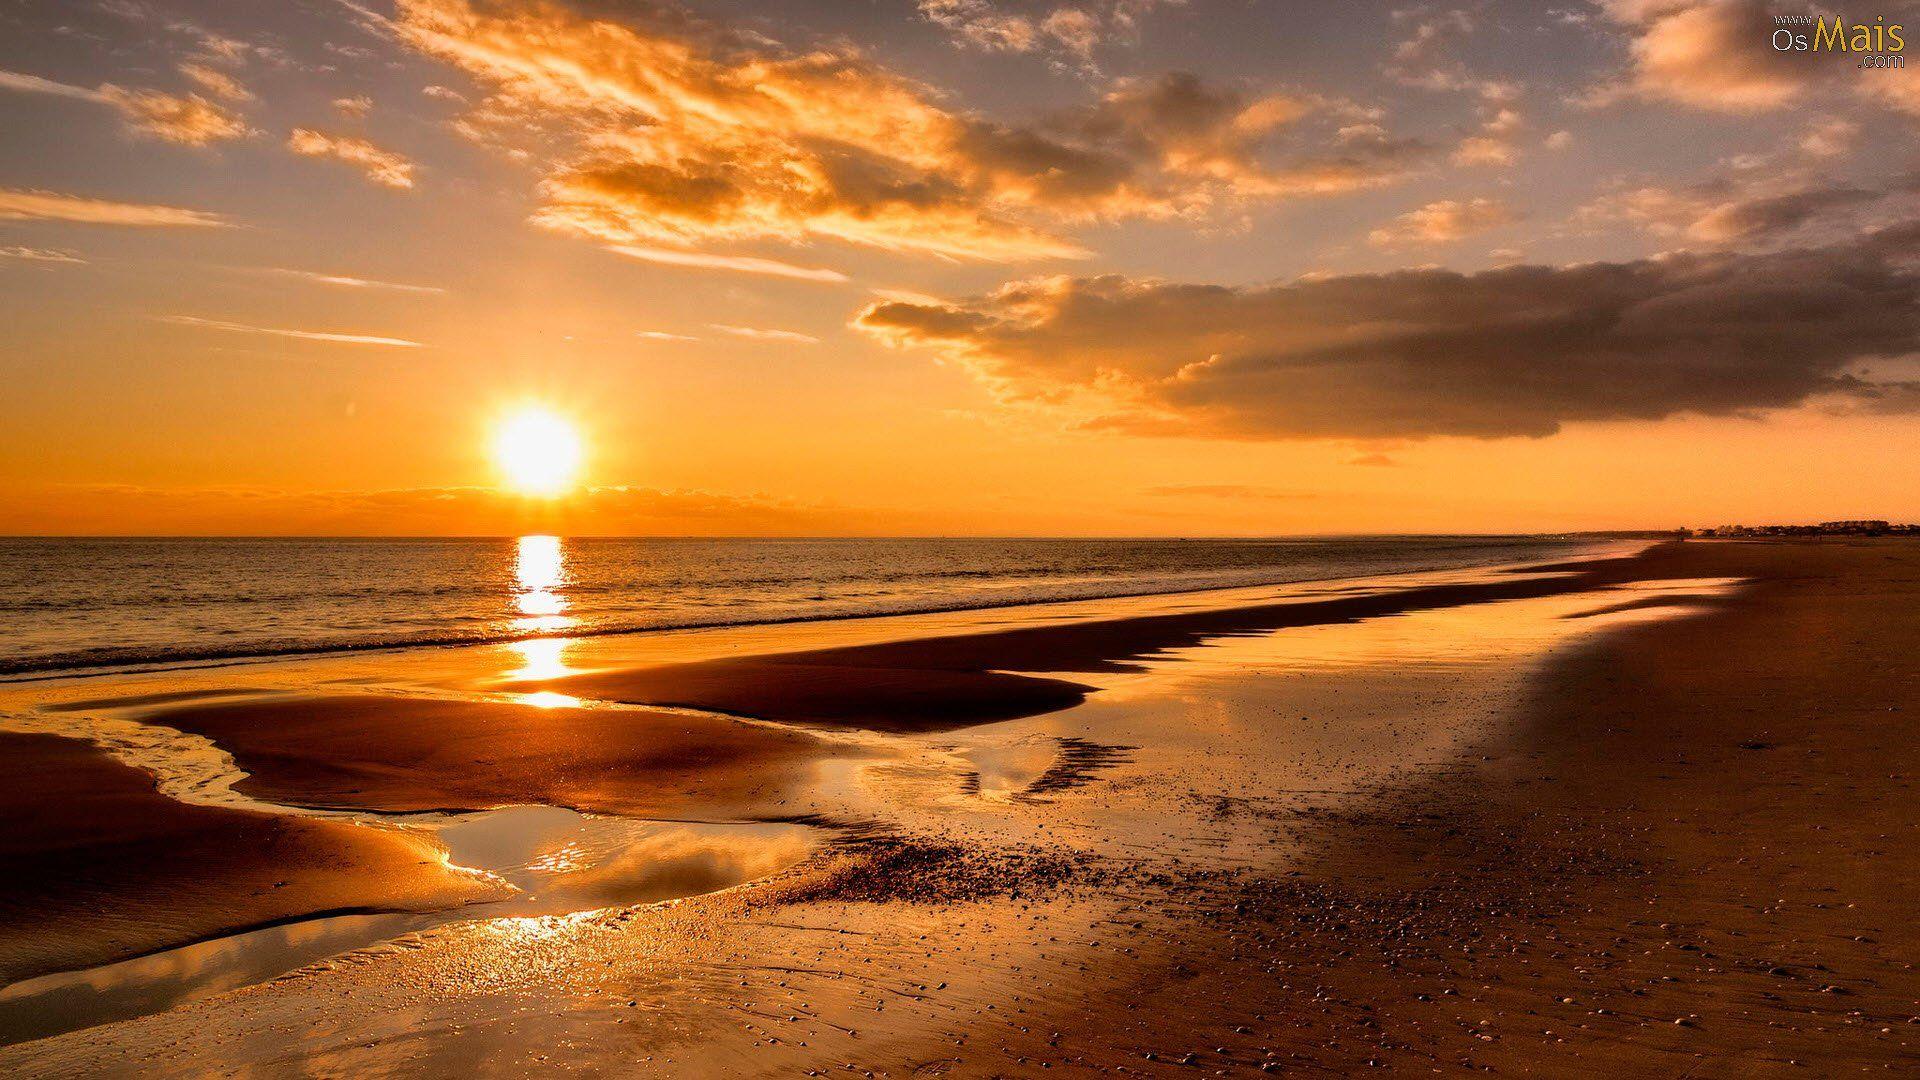 refletindo na praia papel - photo #31